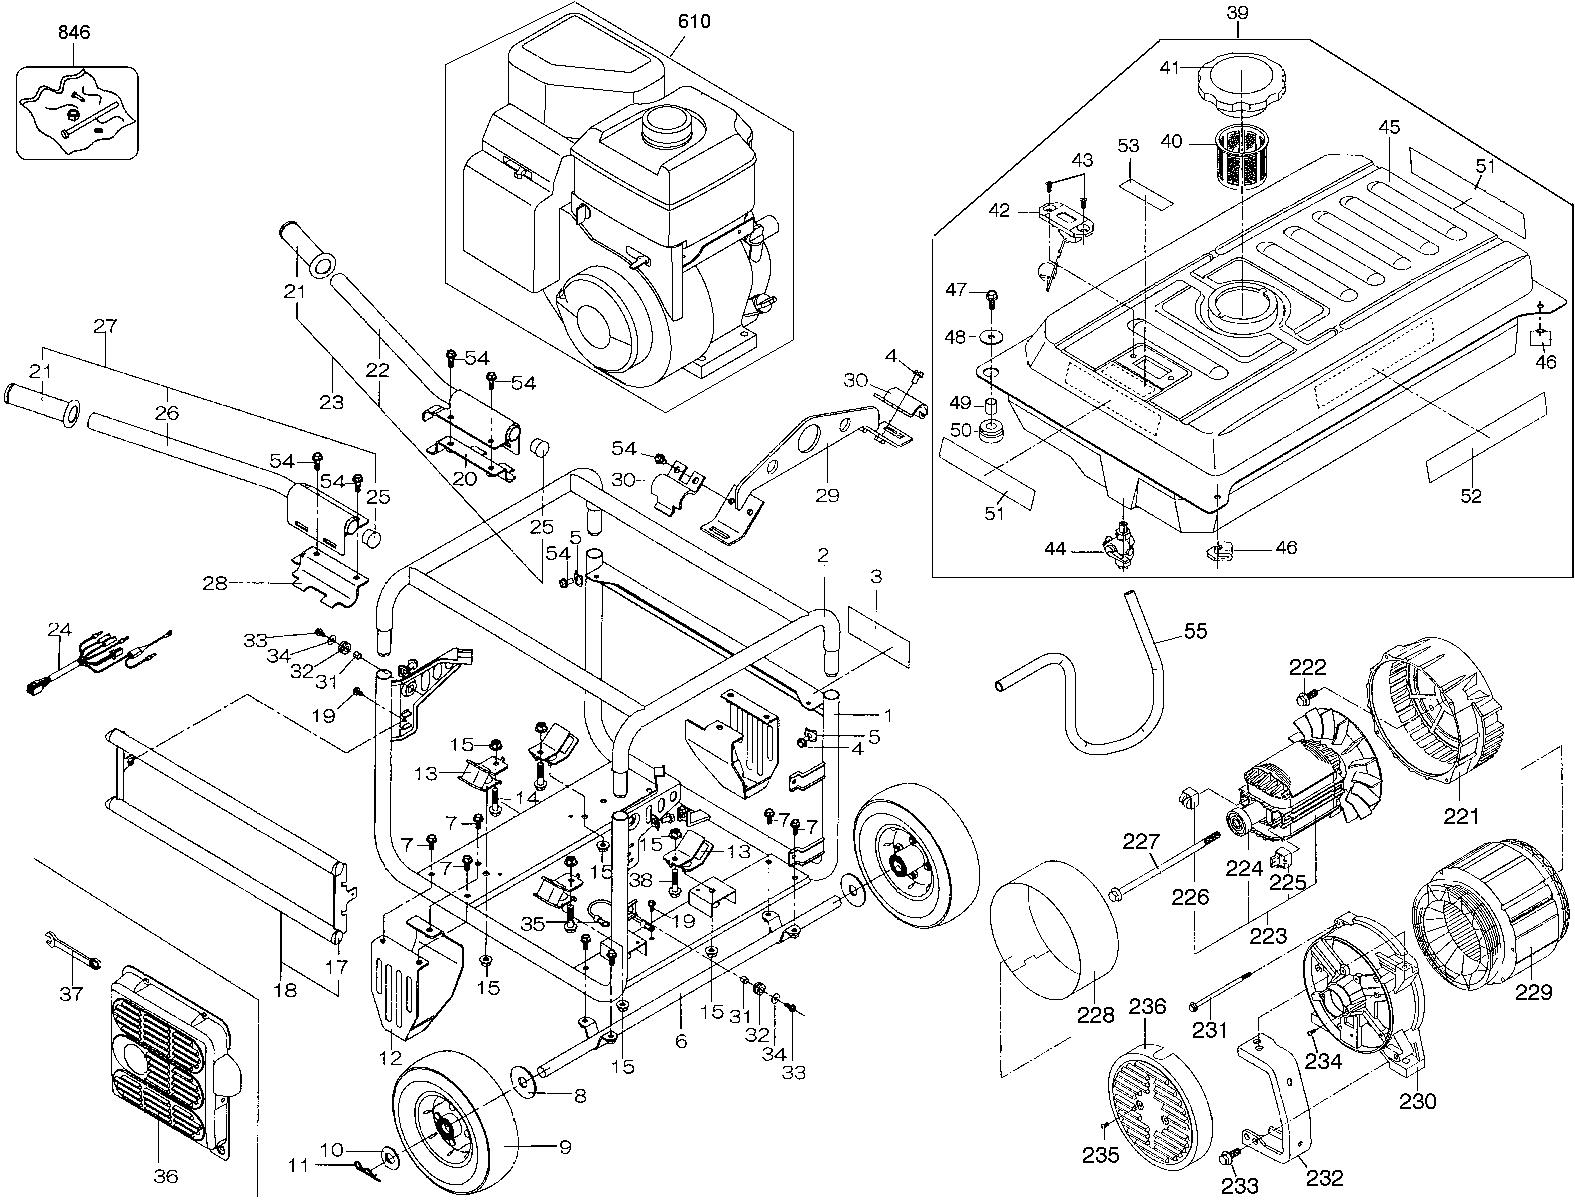 [SCHEMATICS_4JK]  OL_7290] Wiring Diagrams Additionally 2004 International 4300 Wiring Diagram  Wiring Diagram | International 4300 Engine Diagram |  | Ynthe Funi Icism Viewor Mohammedshrine Librar Wiring 101